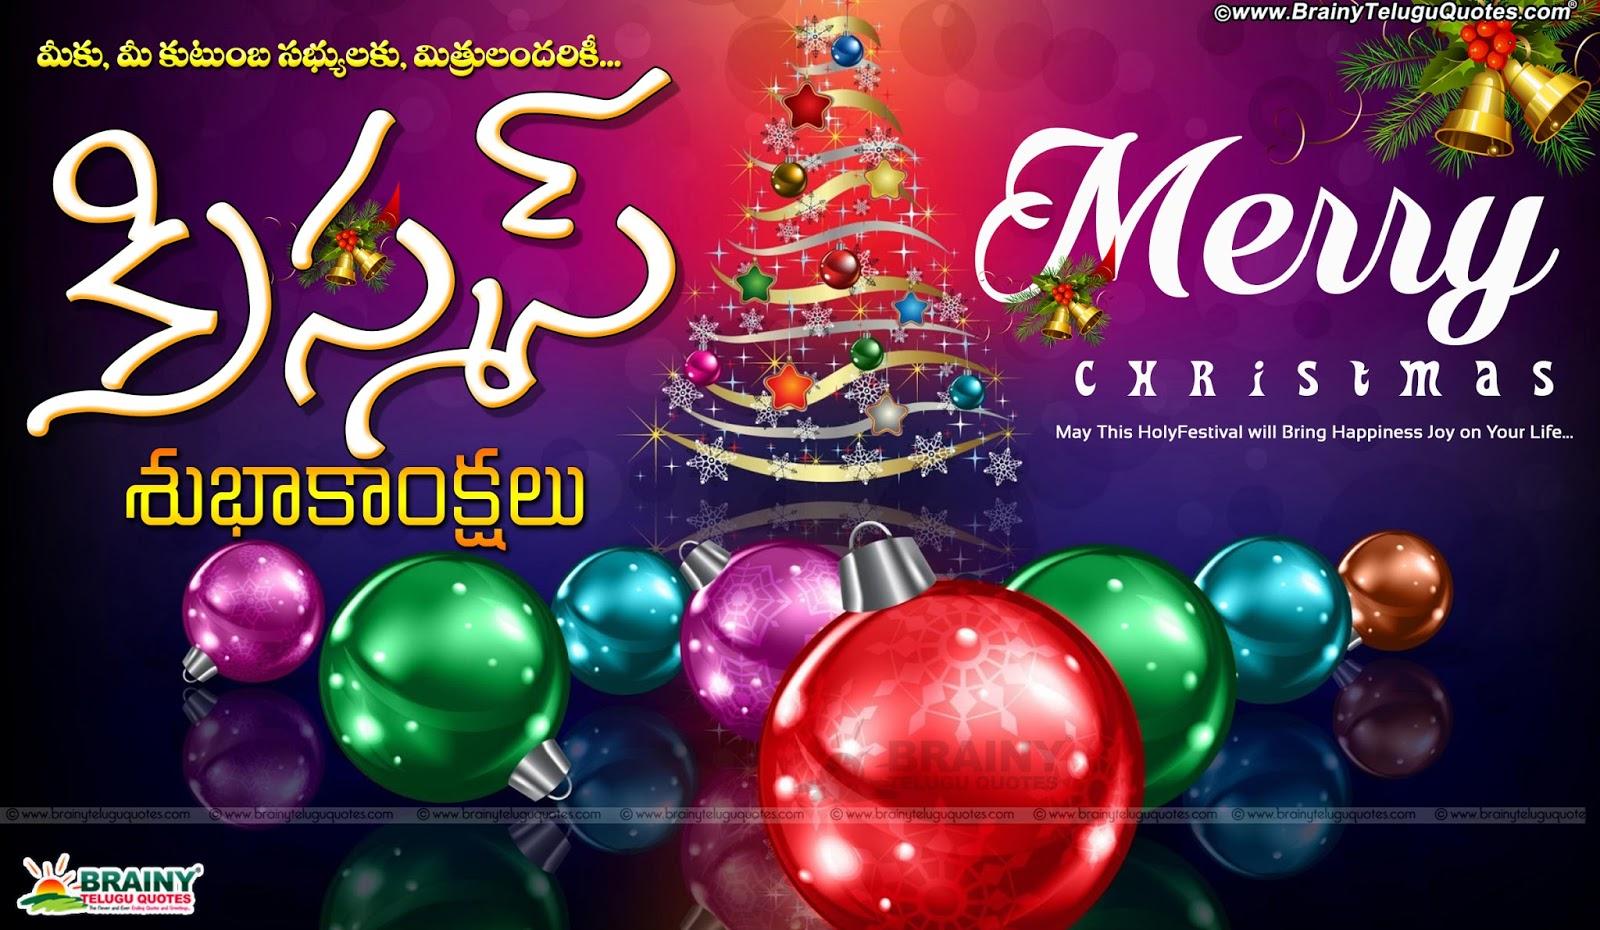 Telugu Latest Online Greetings Of Christmas, Here Is The Free Telugu  Christmas Telugu Greetings, Christmas Quotes In Telugu, Telugu Online  Latest Christmas ...